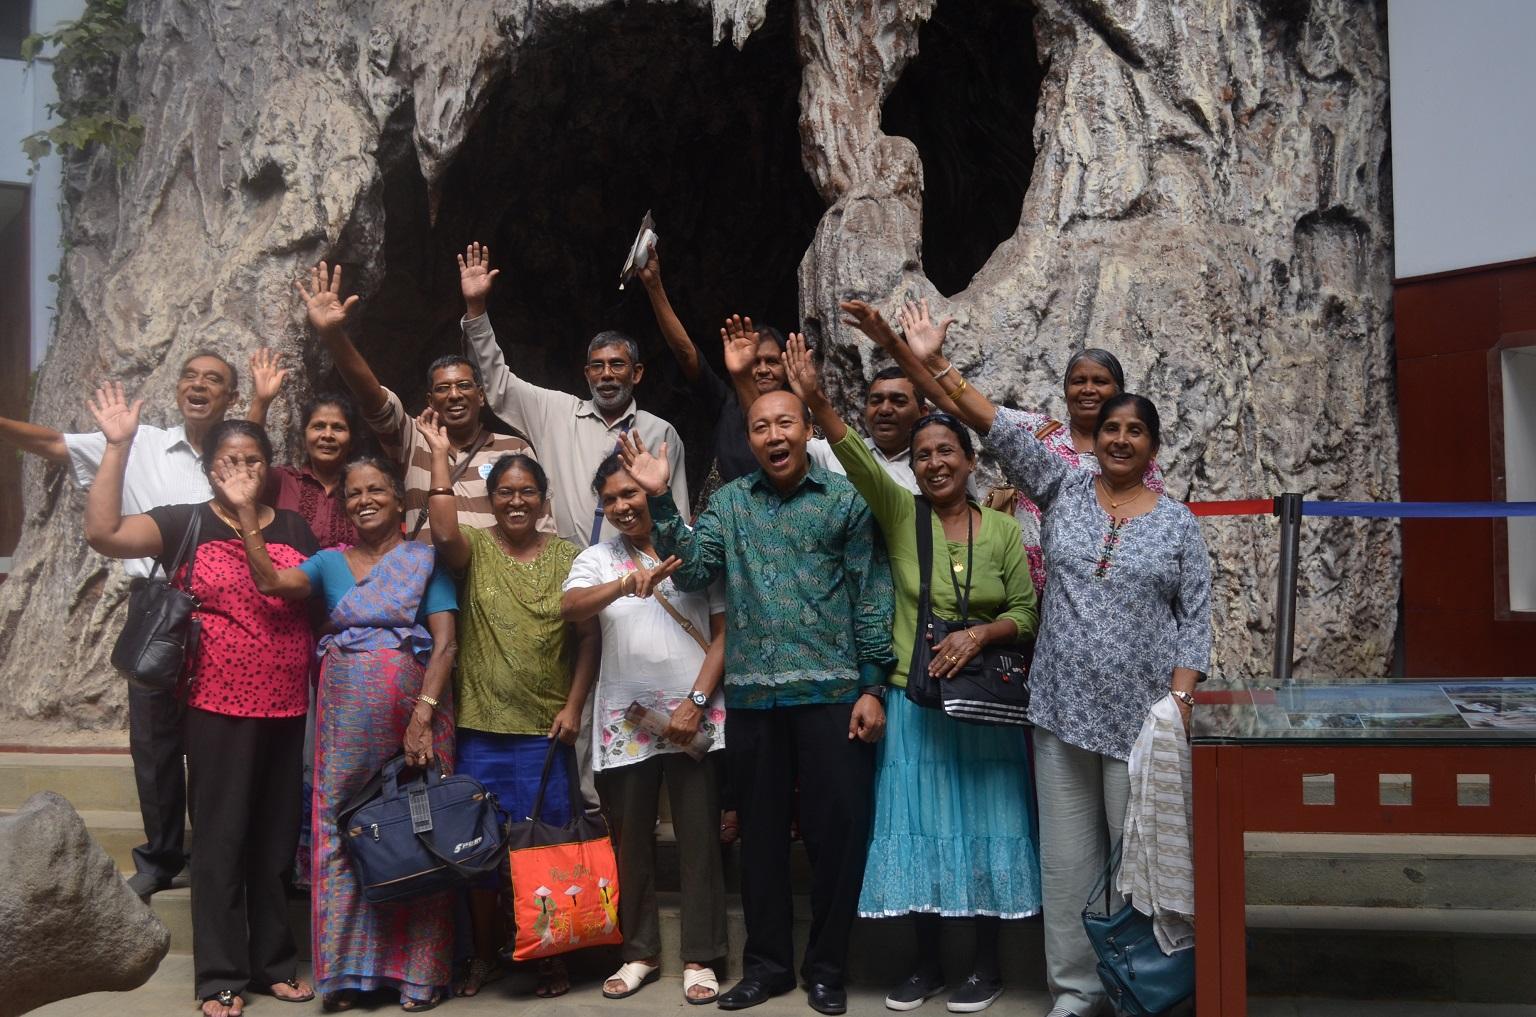 Uptd Pengelolaan Kebudayaan Daerah Jawa Barat Berlangsungnya Acara Milangkala Museum